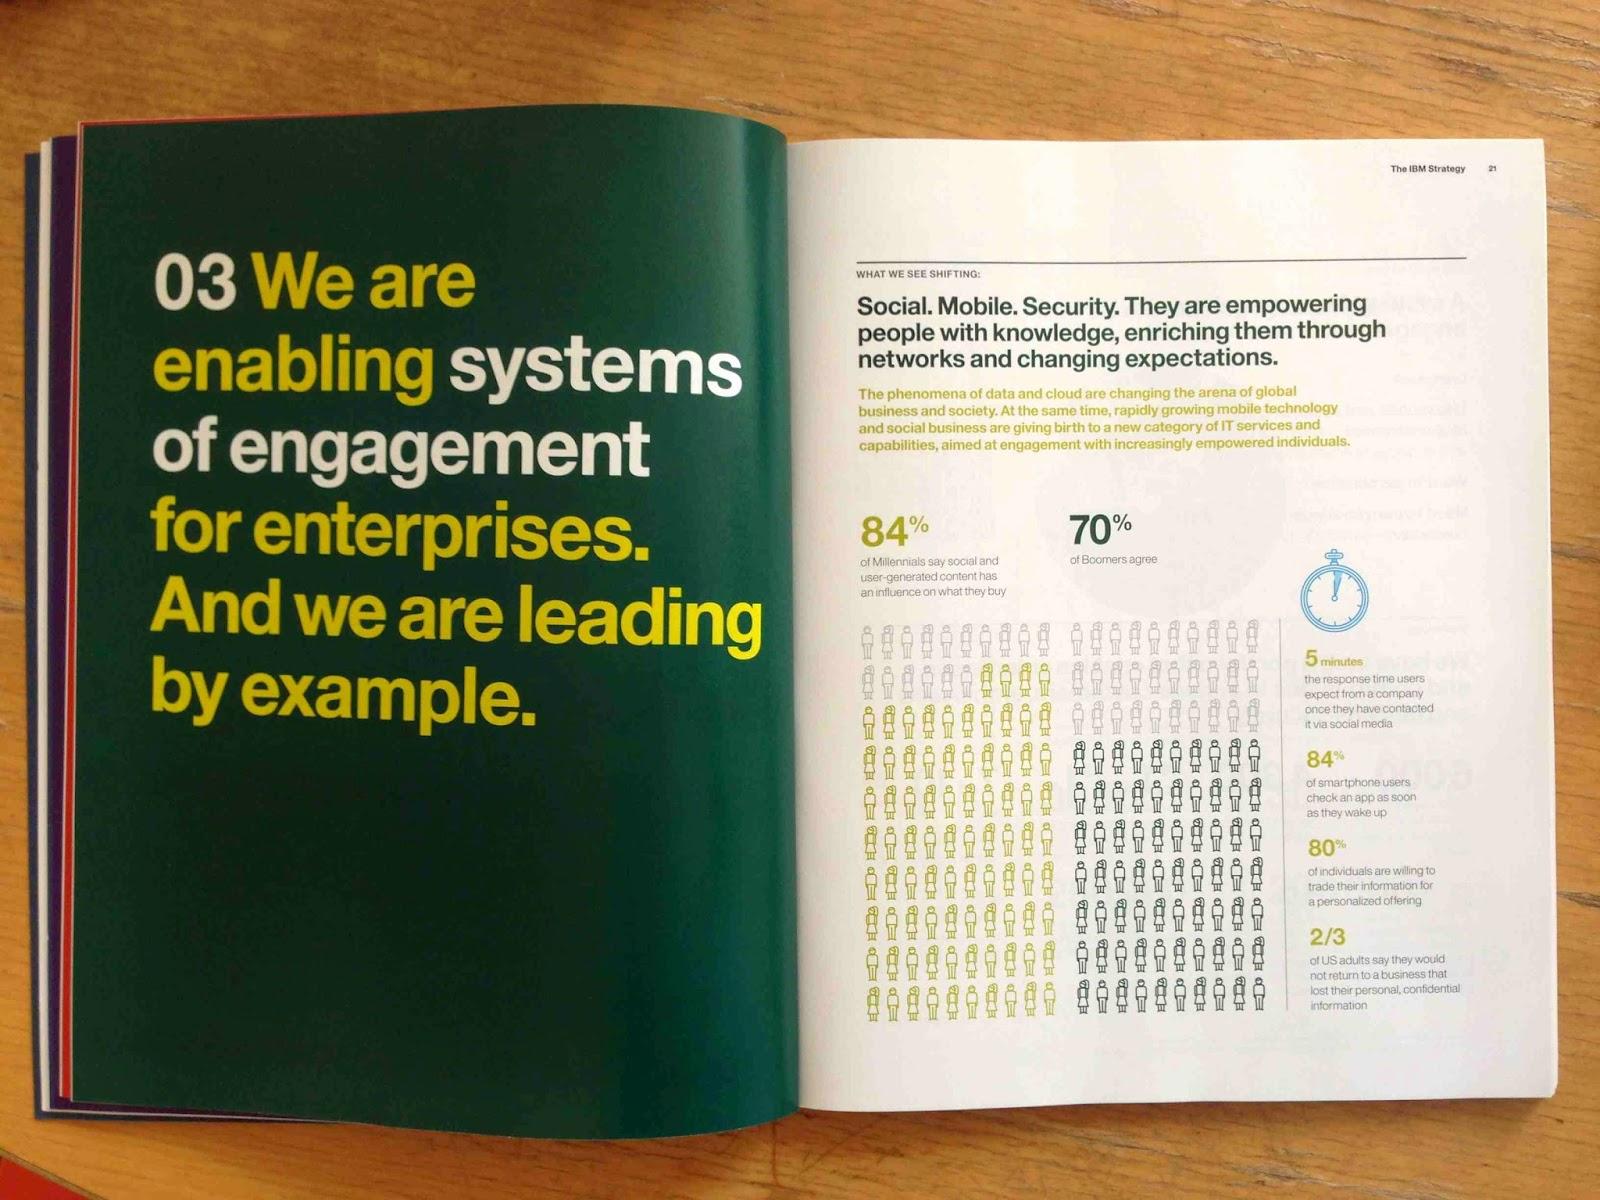 ibm 2014 annual report pdf